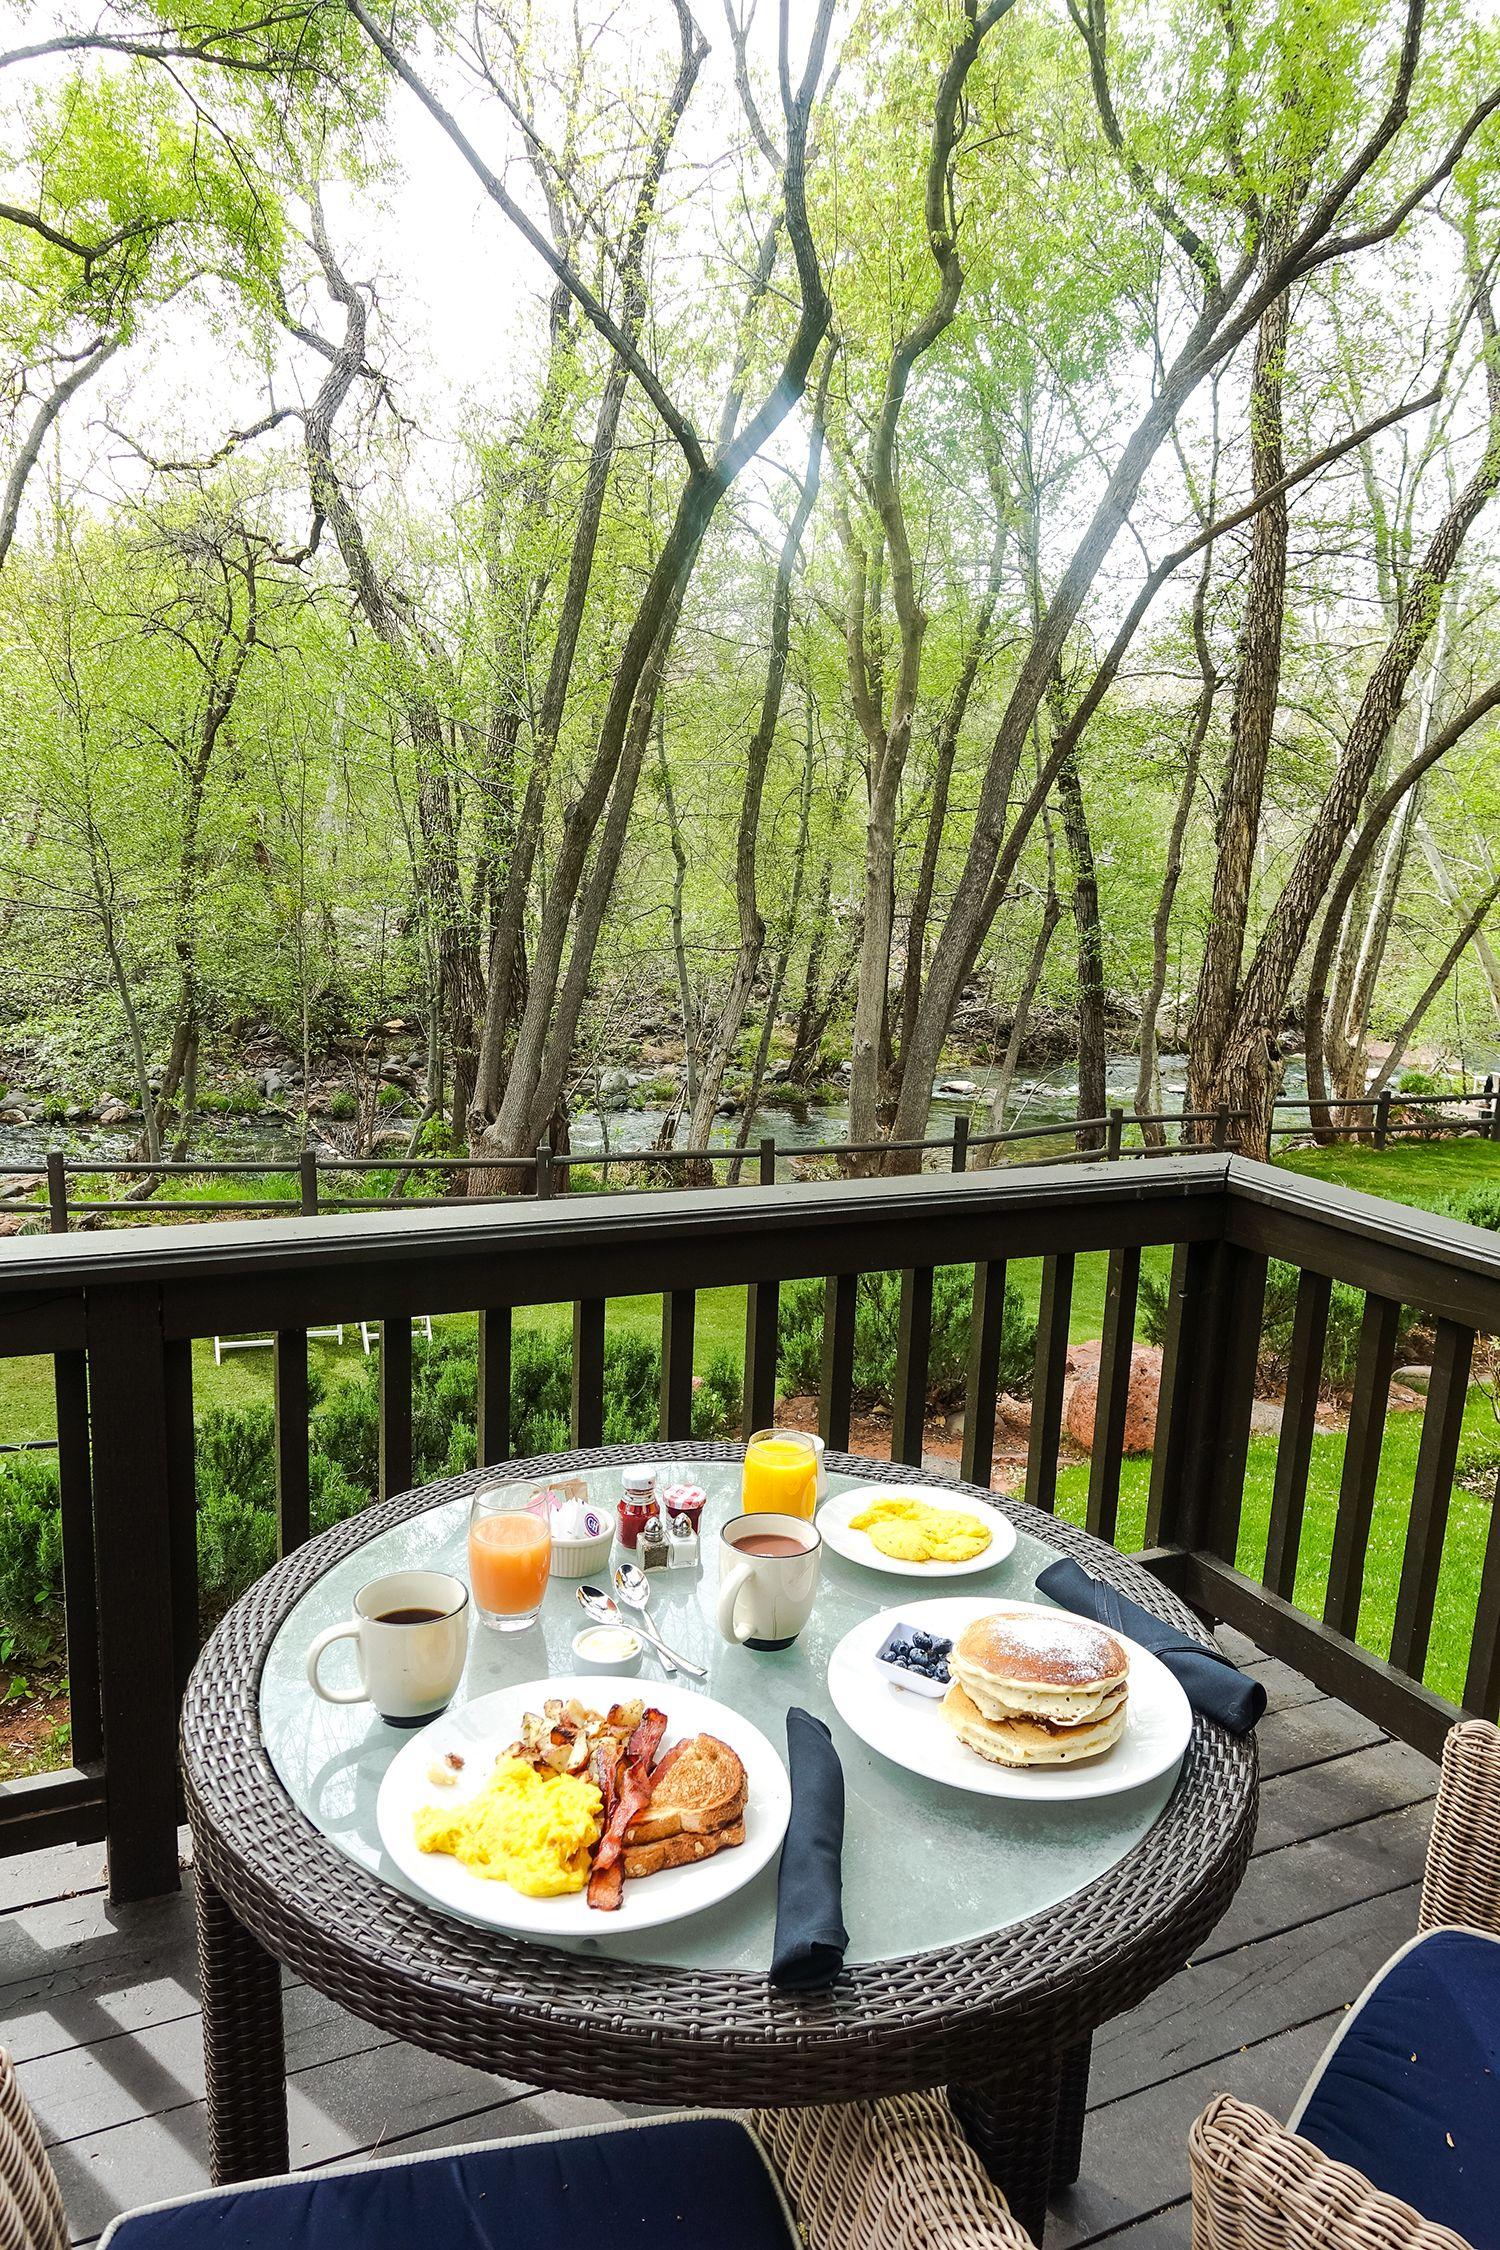 Breakfast by the creek at L'Auberge de Sedona, Arizona